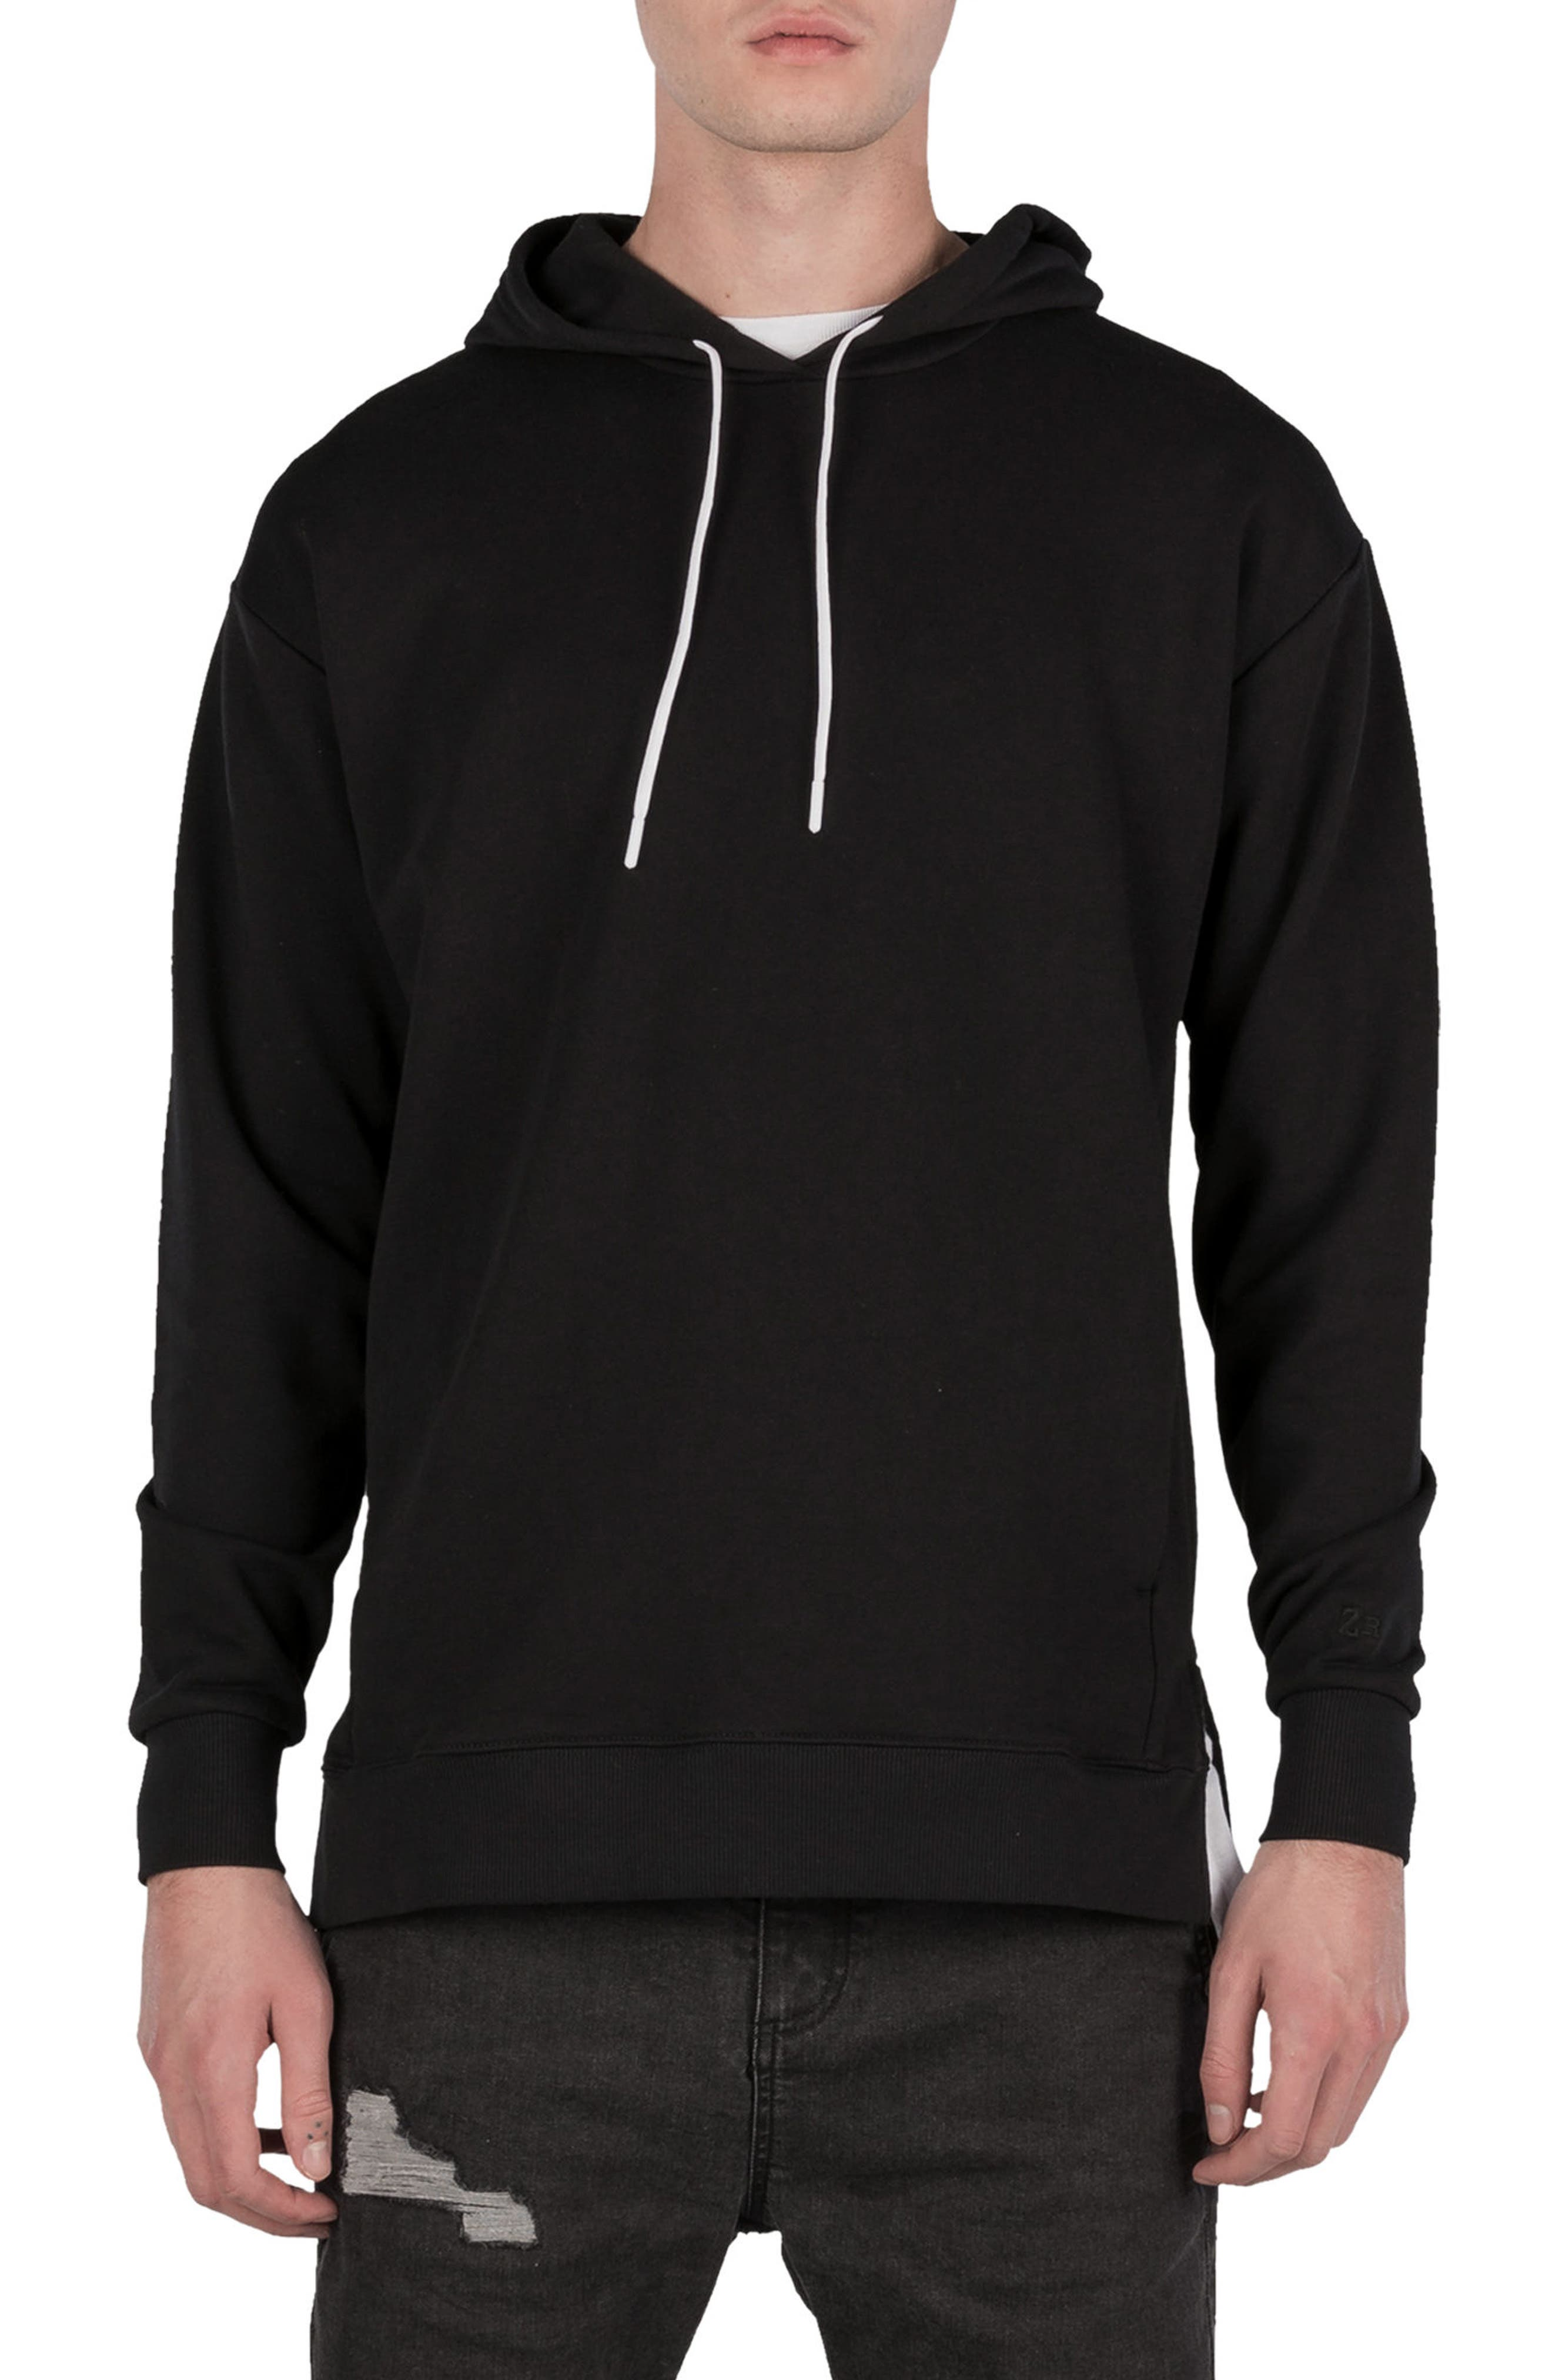 Rugger Hooded Sweatshirt,                             Main thumbnail 1, color,                             BLACK